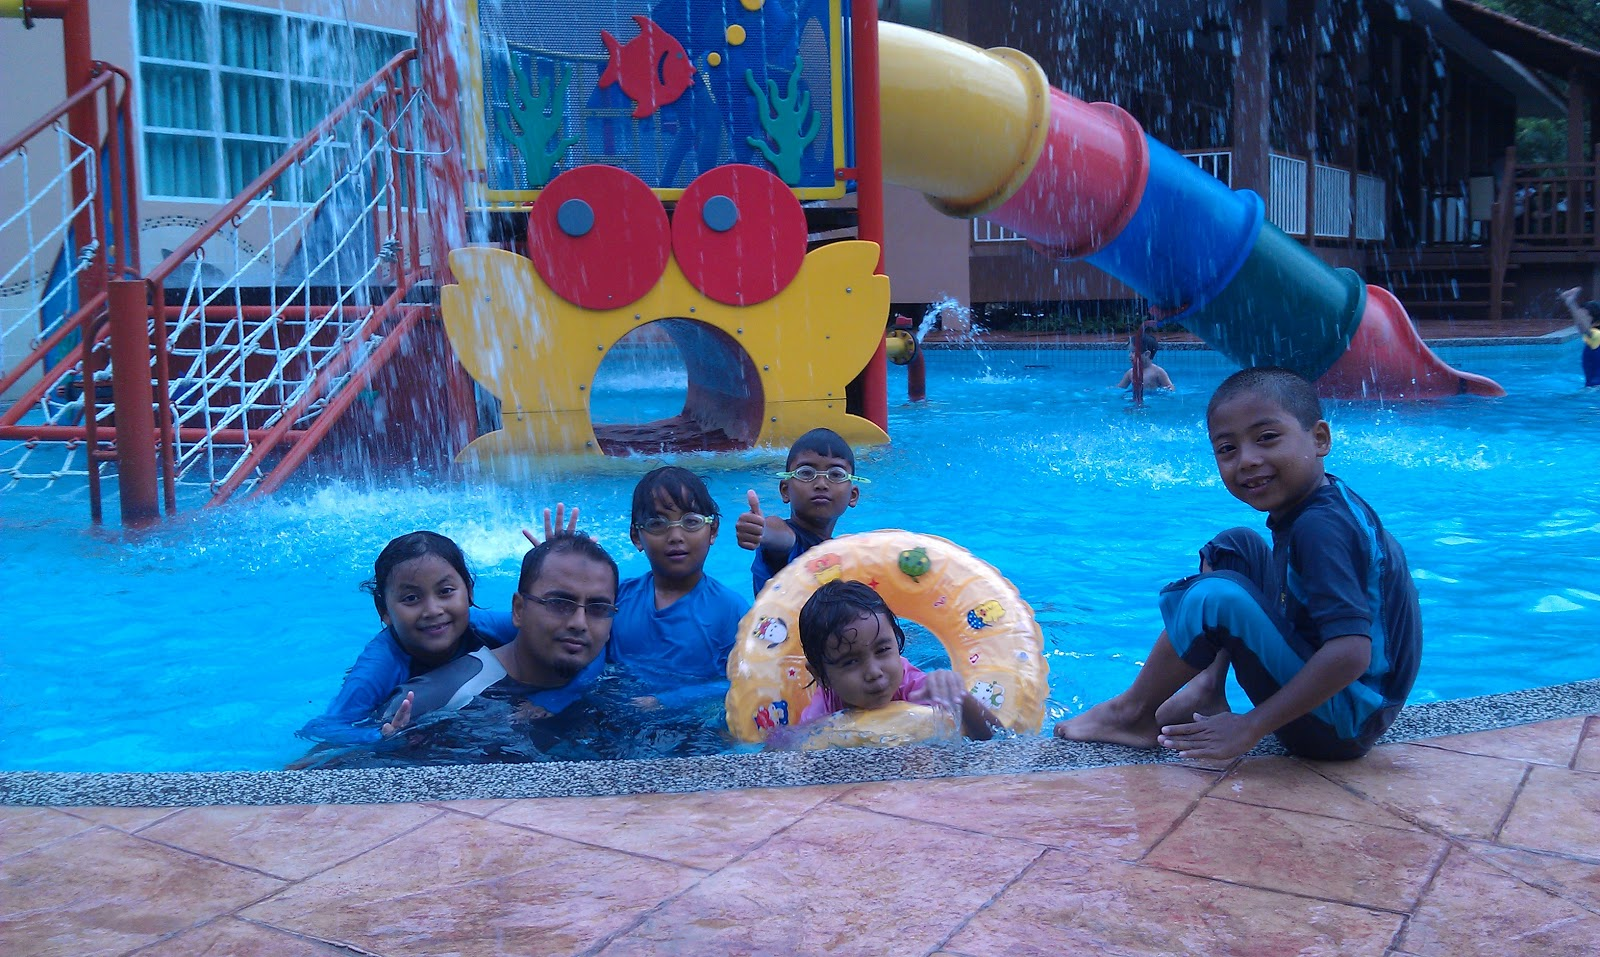 Cherish Your Life Cuti Cuti Taiping